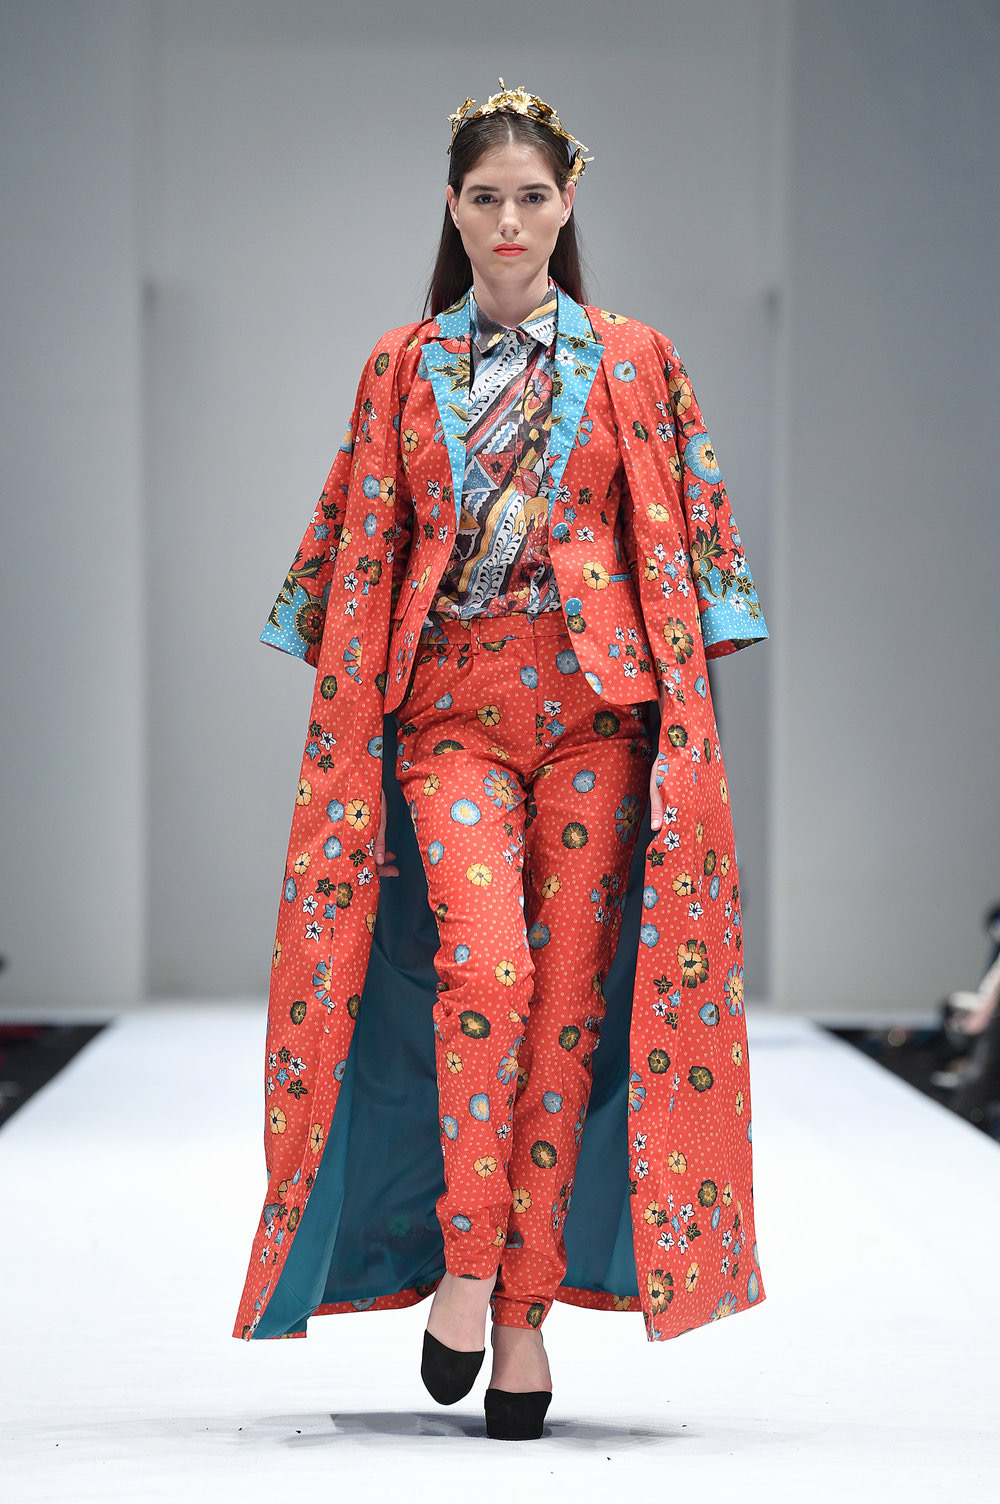 Baju batik colourfull dengan crape